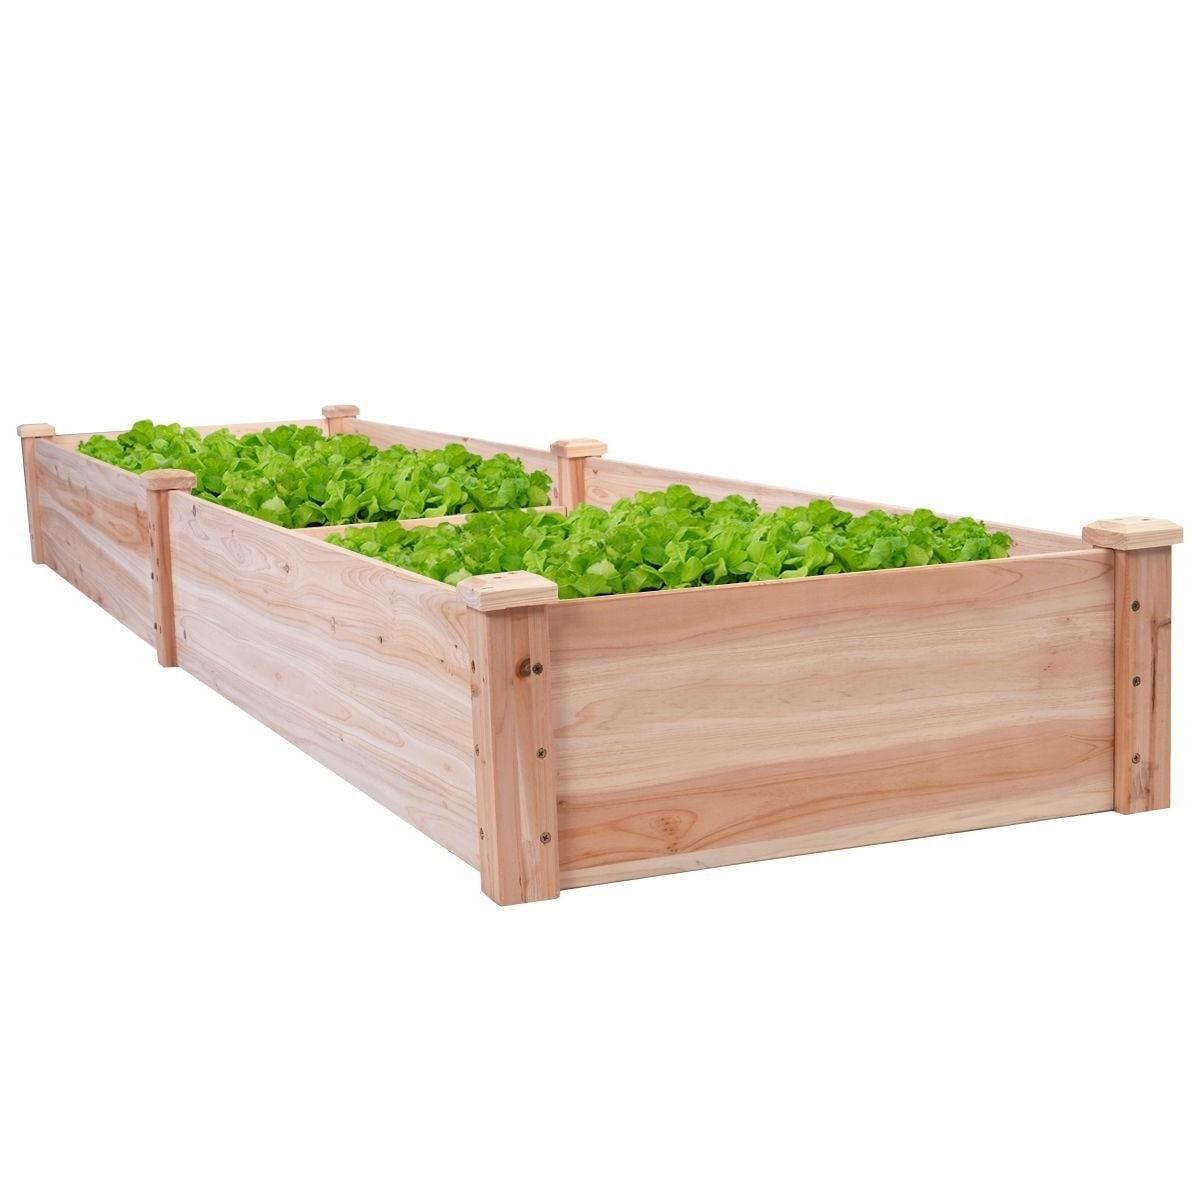 8 Ft X 2 Raised Garden Bed Planter